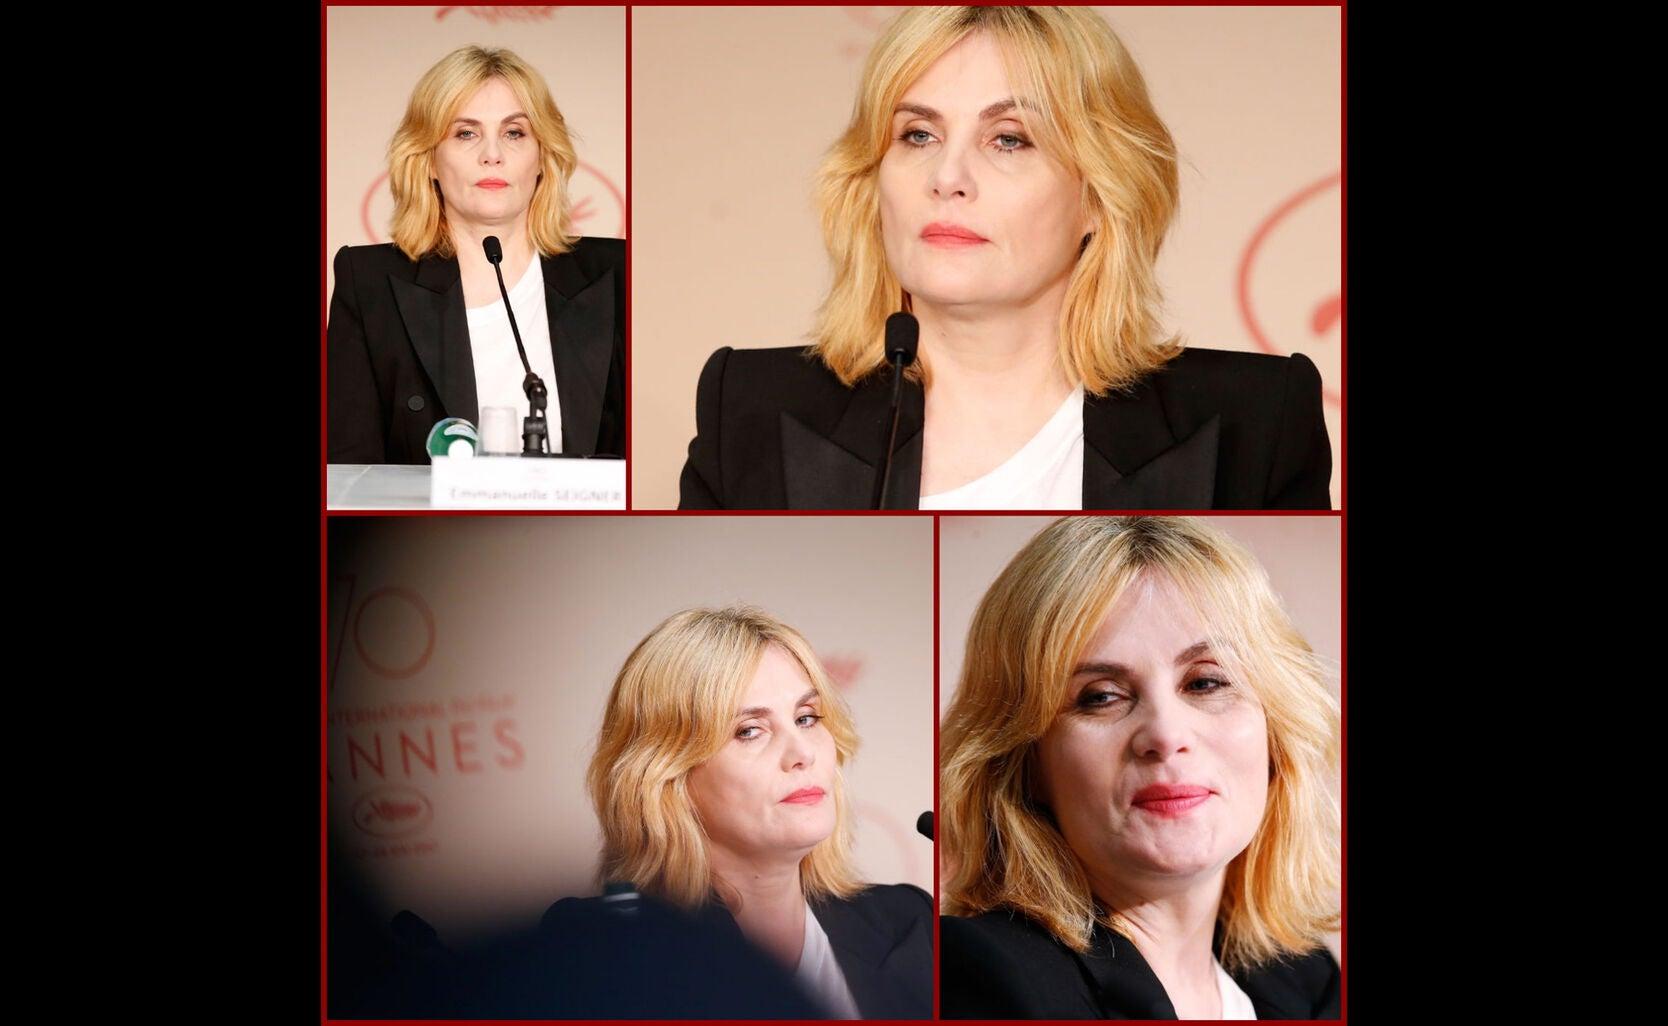 Cannes 2017 Film Festival